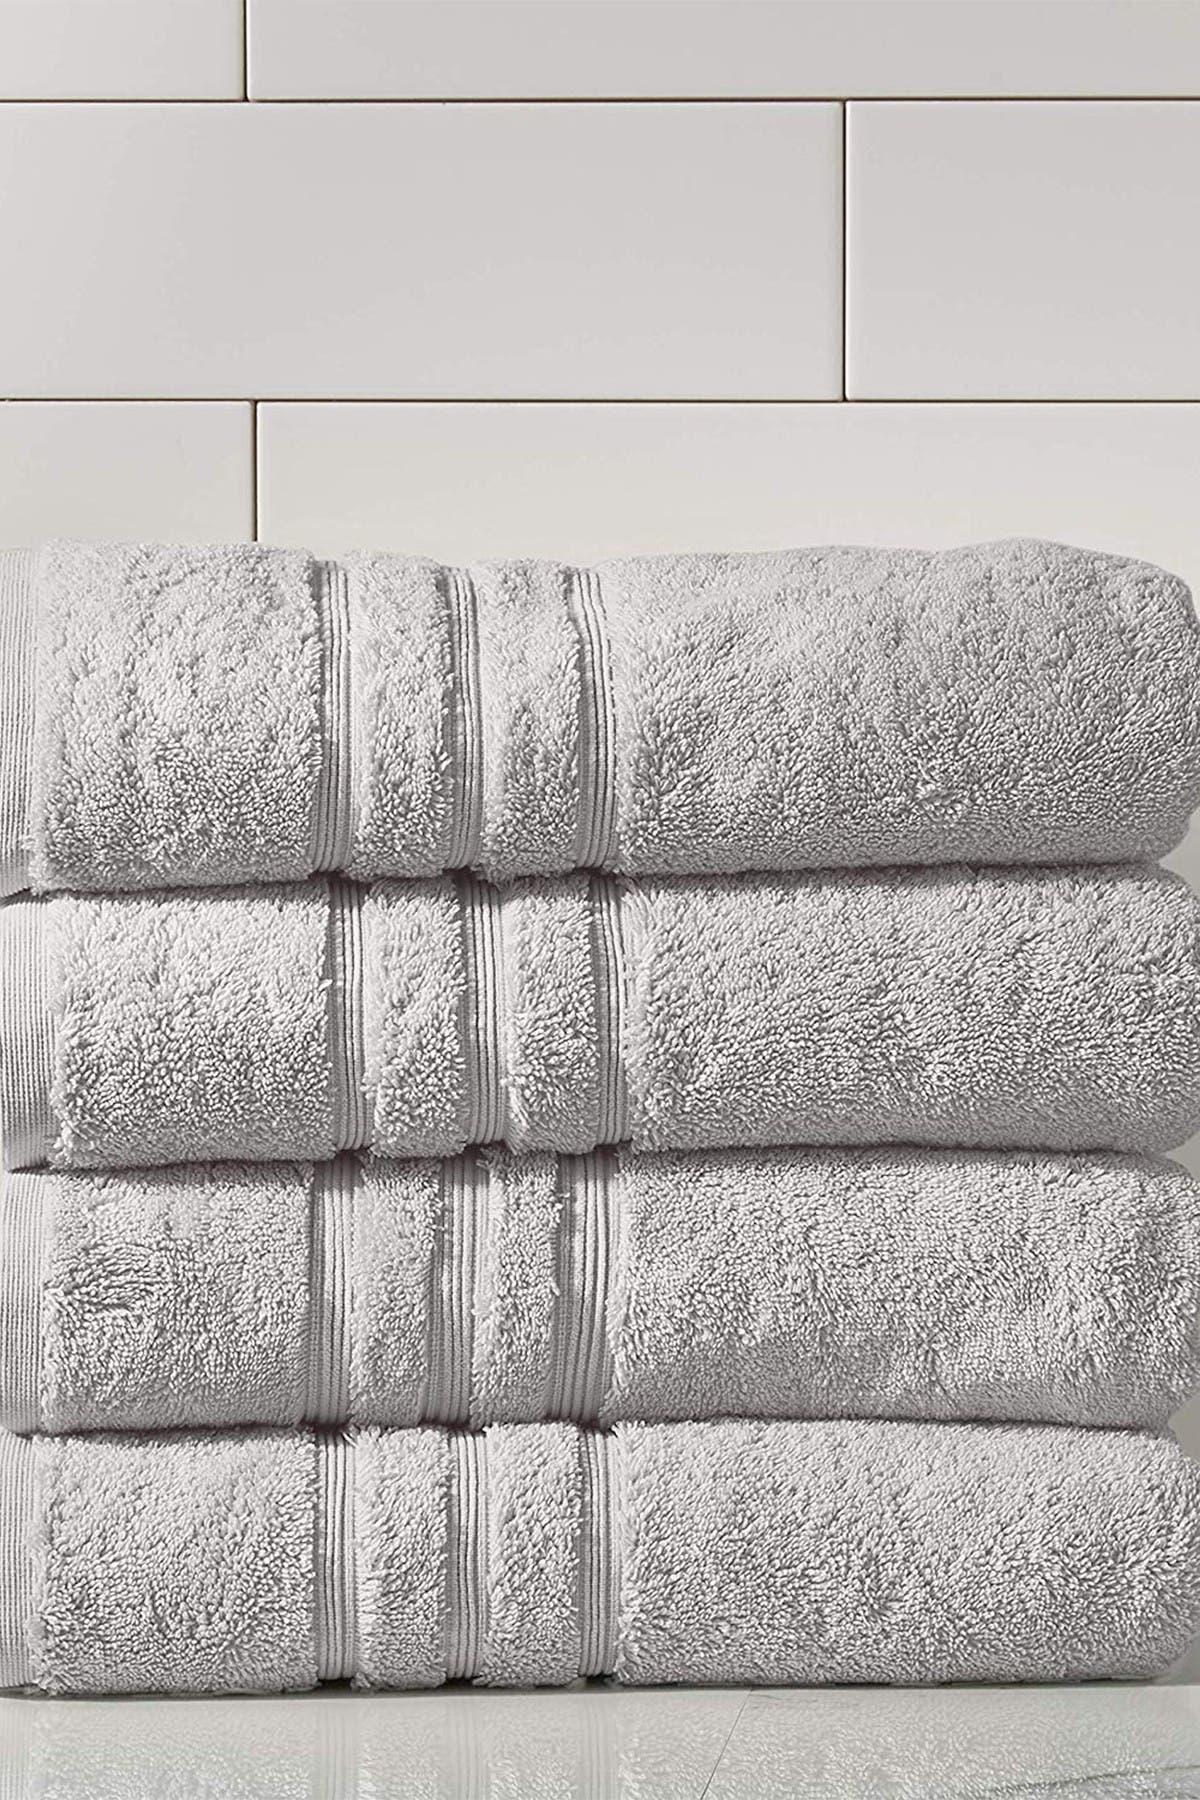 Image of Modern Threads Manor Ridge Turkish Cotton 700 GSM Bath Towel - Set of 4 - Grey